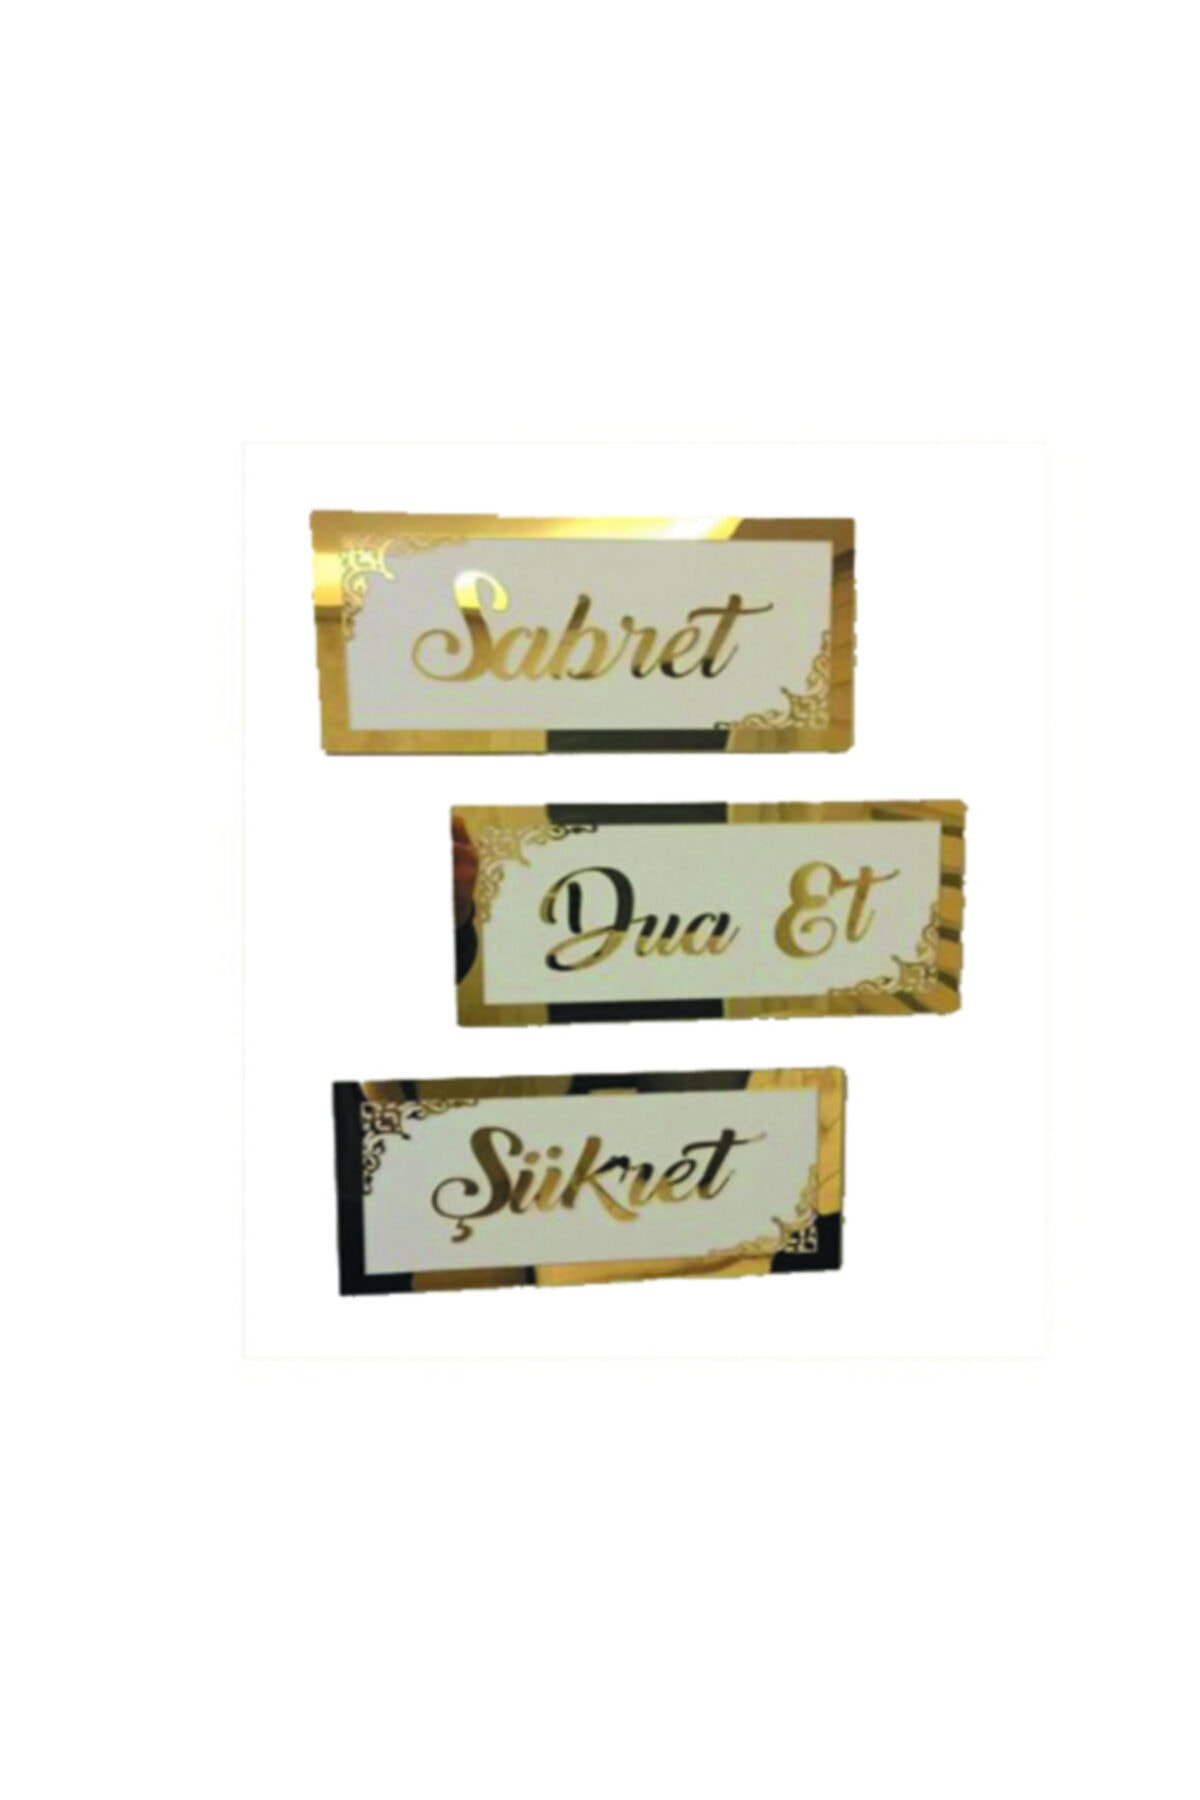 Motifli 3d Sabret Şükret Dua Et 3'lü Set (15*30) Gold